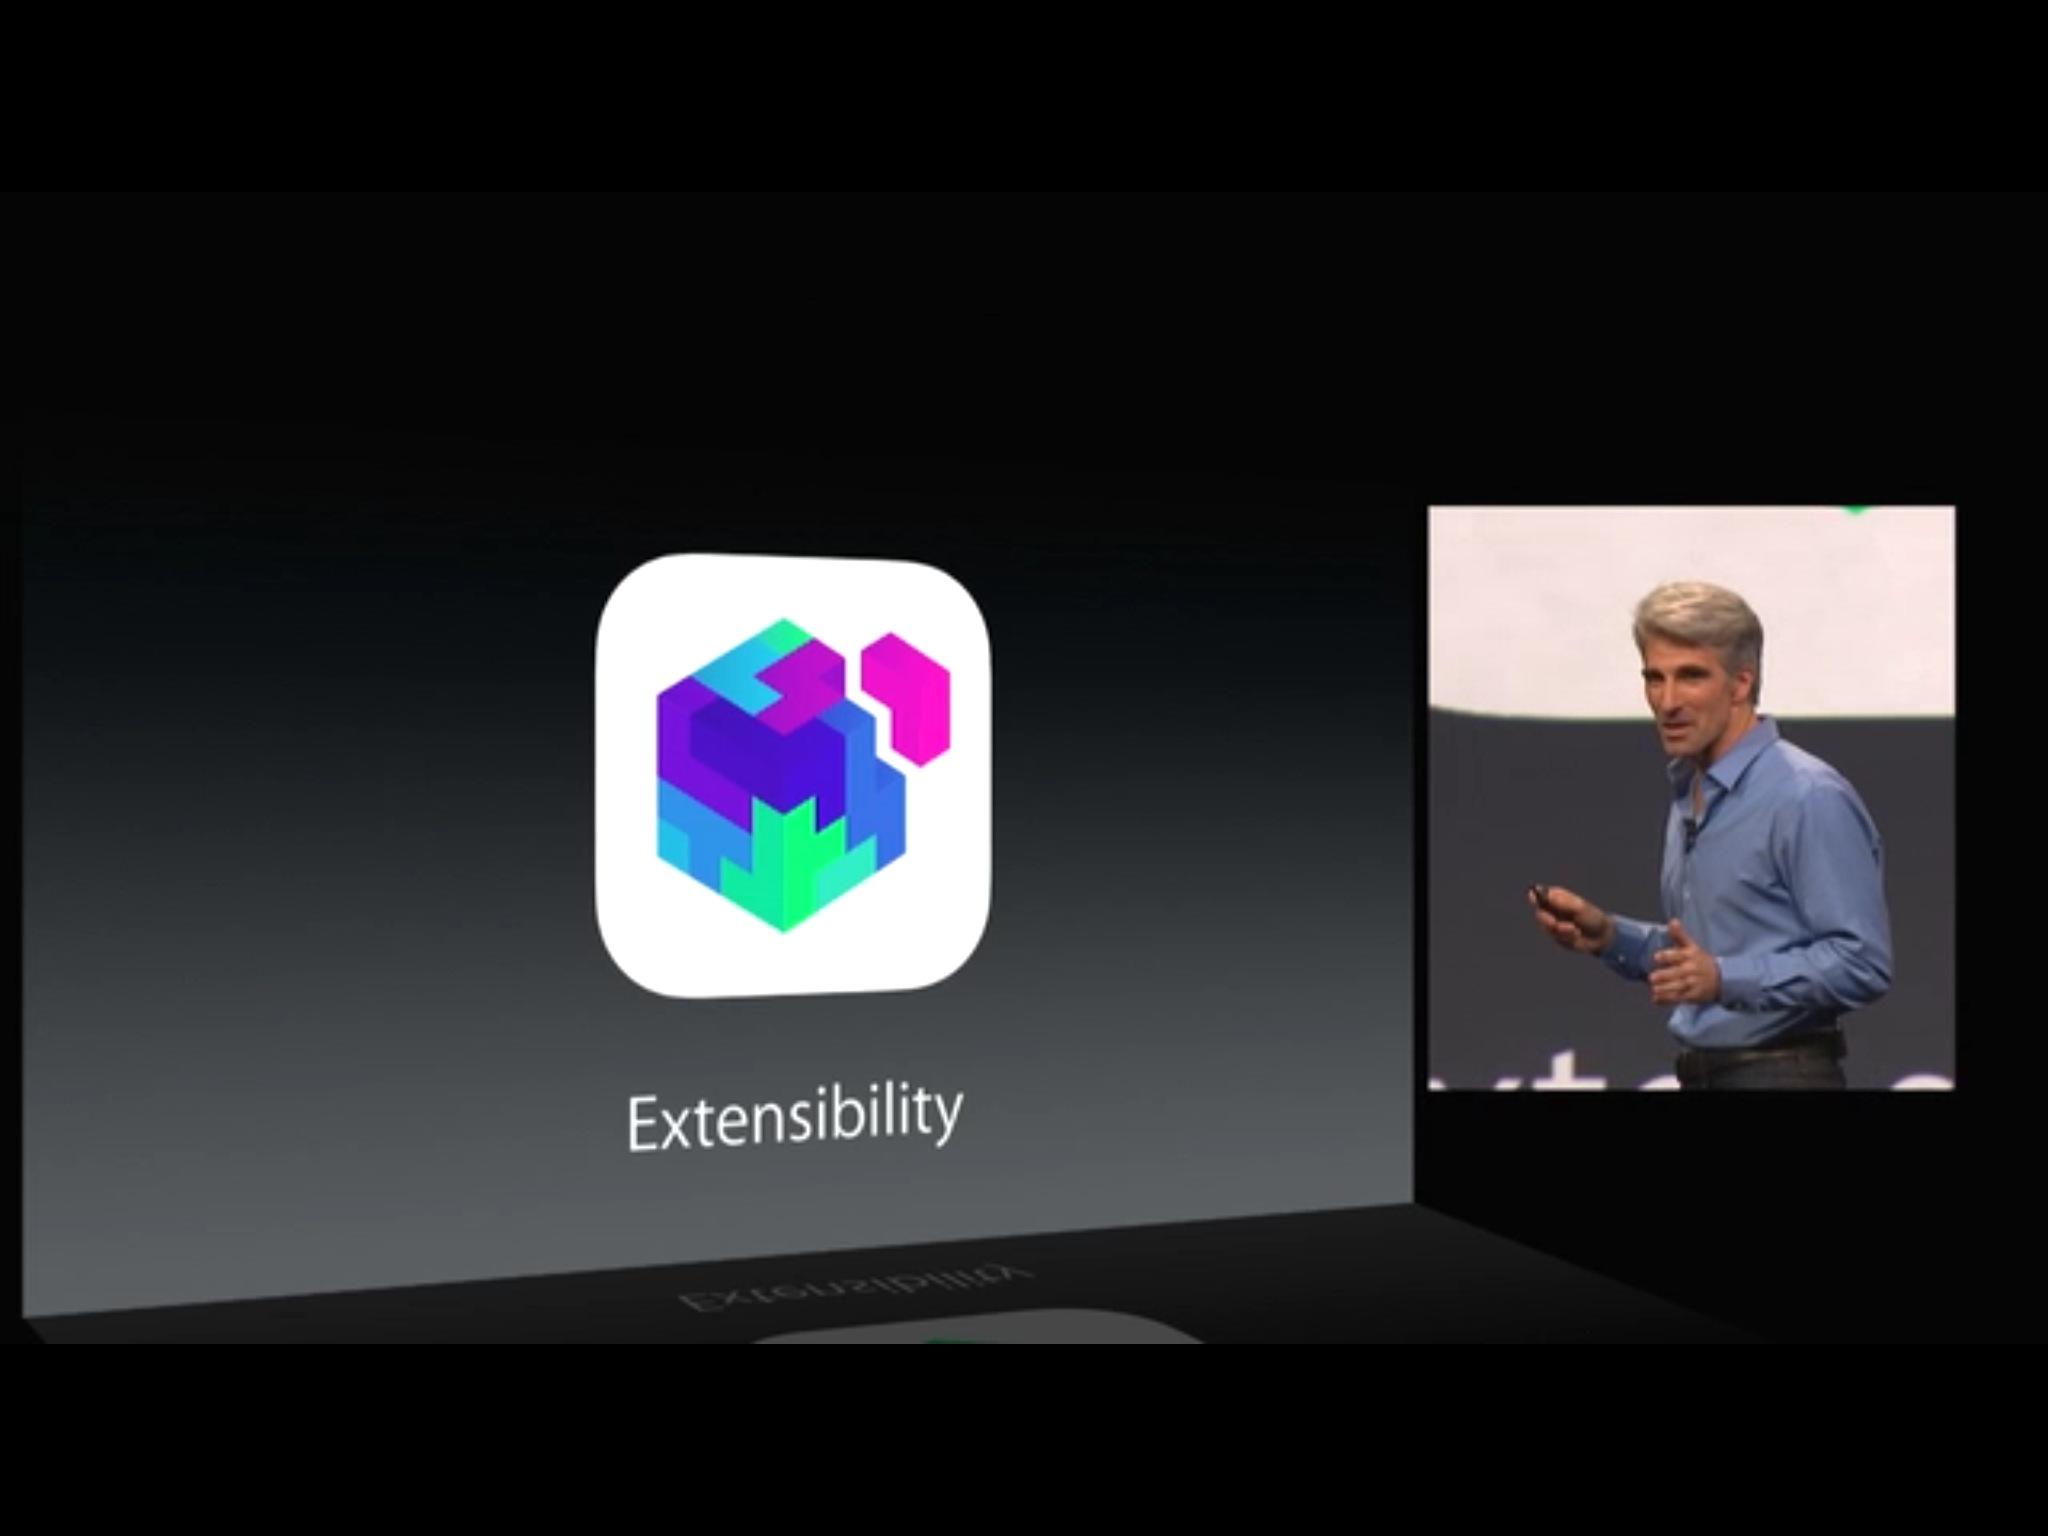 1Password iOS 8 One-Tap Login